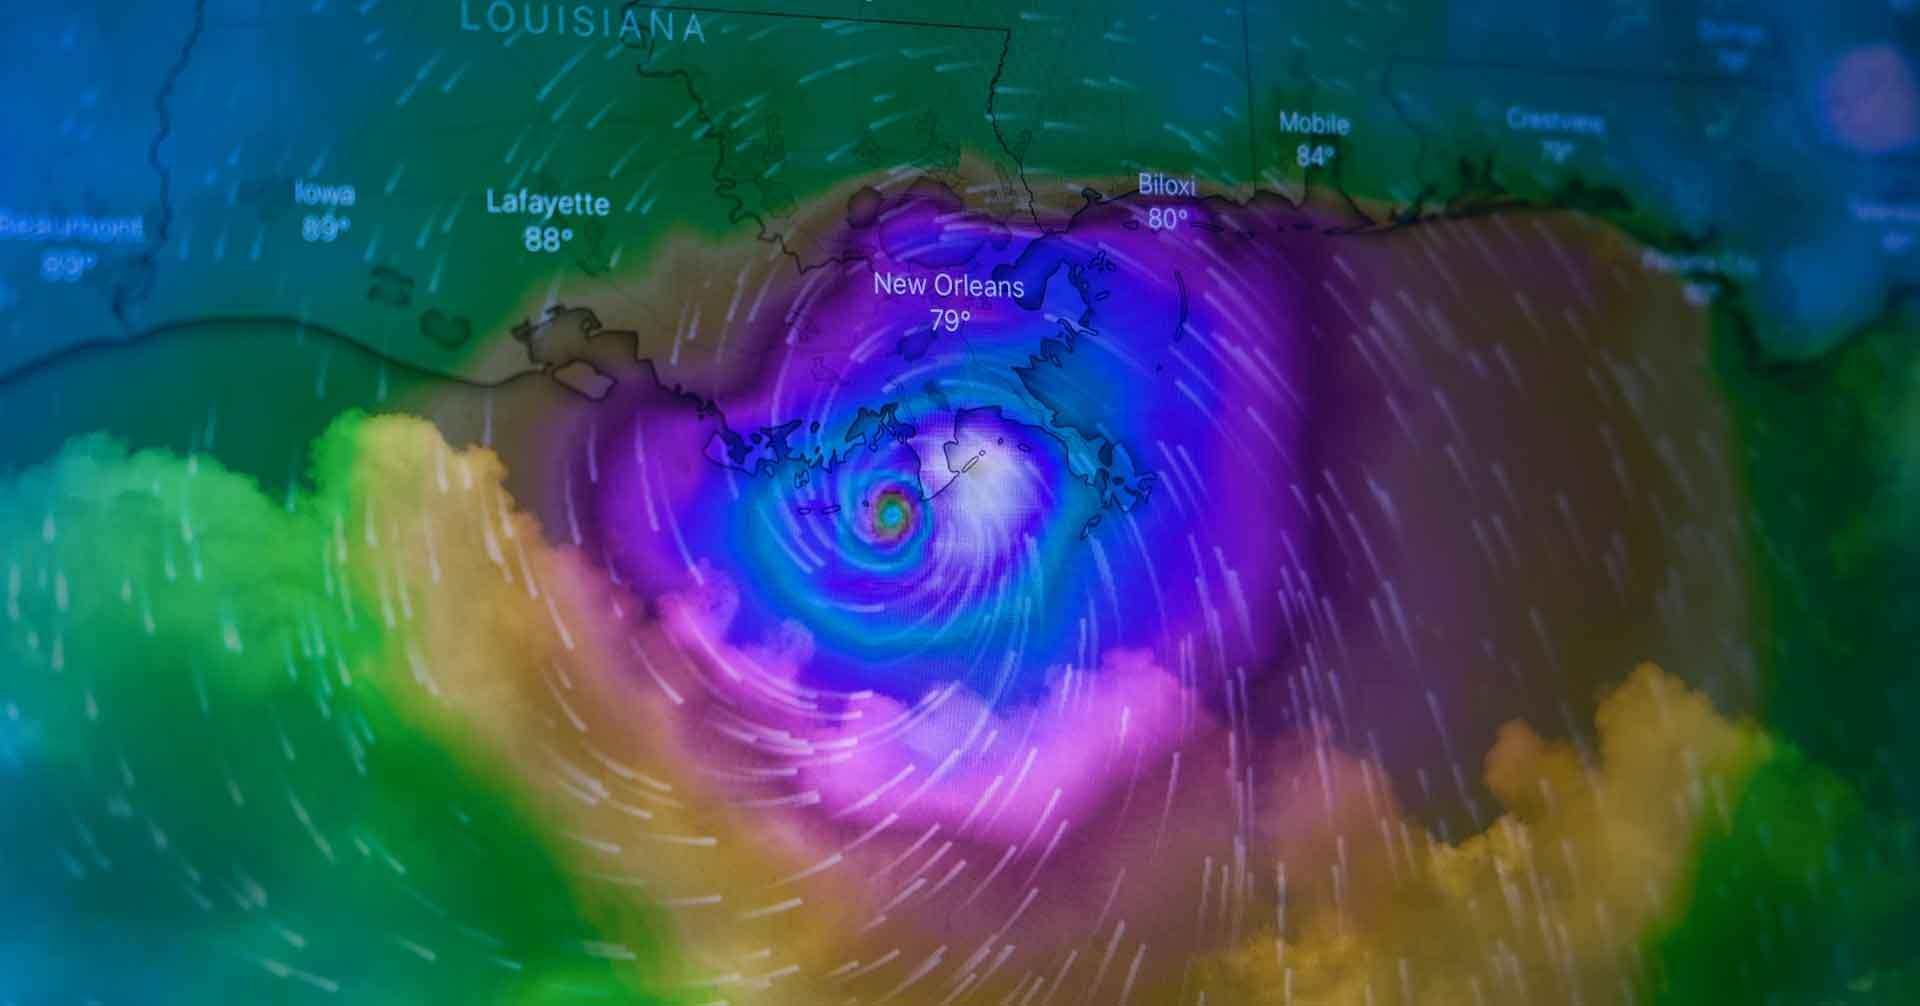 Rainbow colored radar of a hurricane over Louisiana